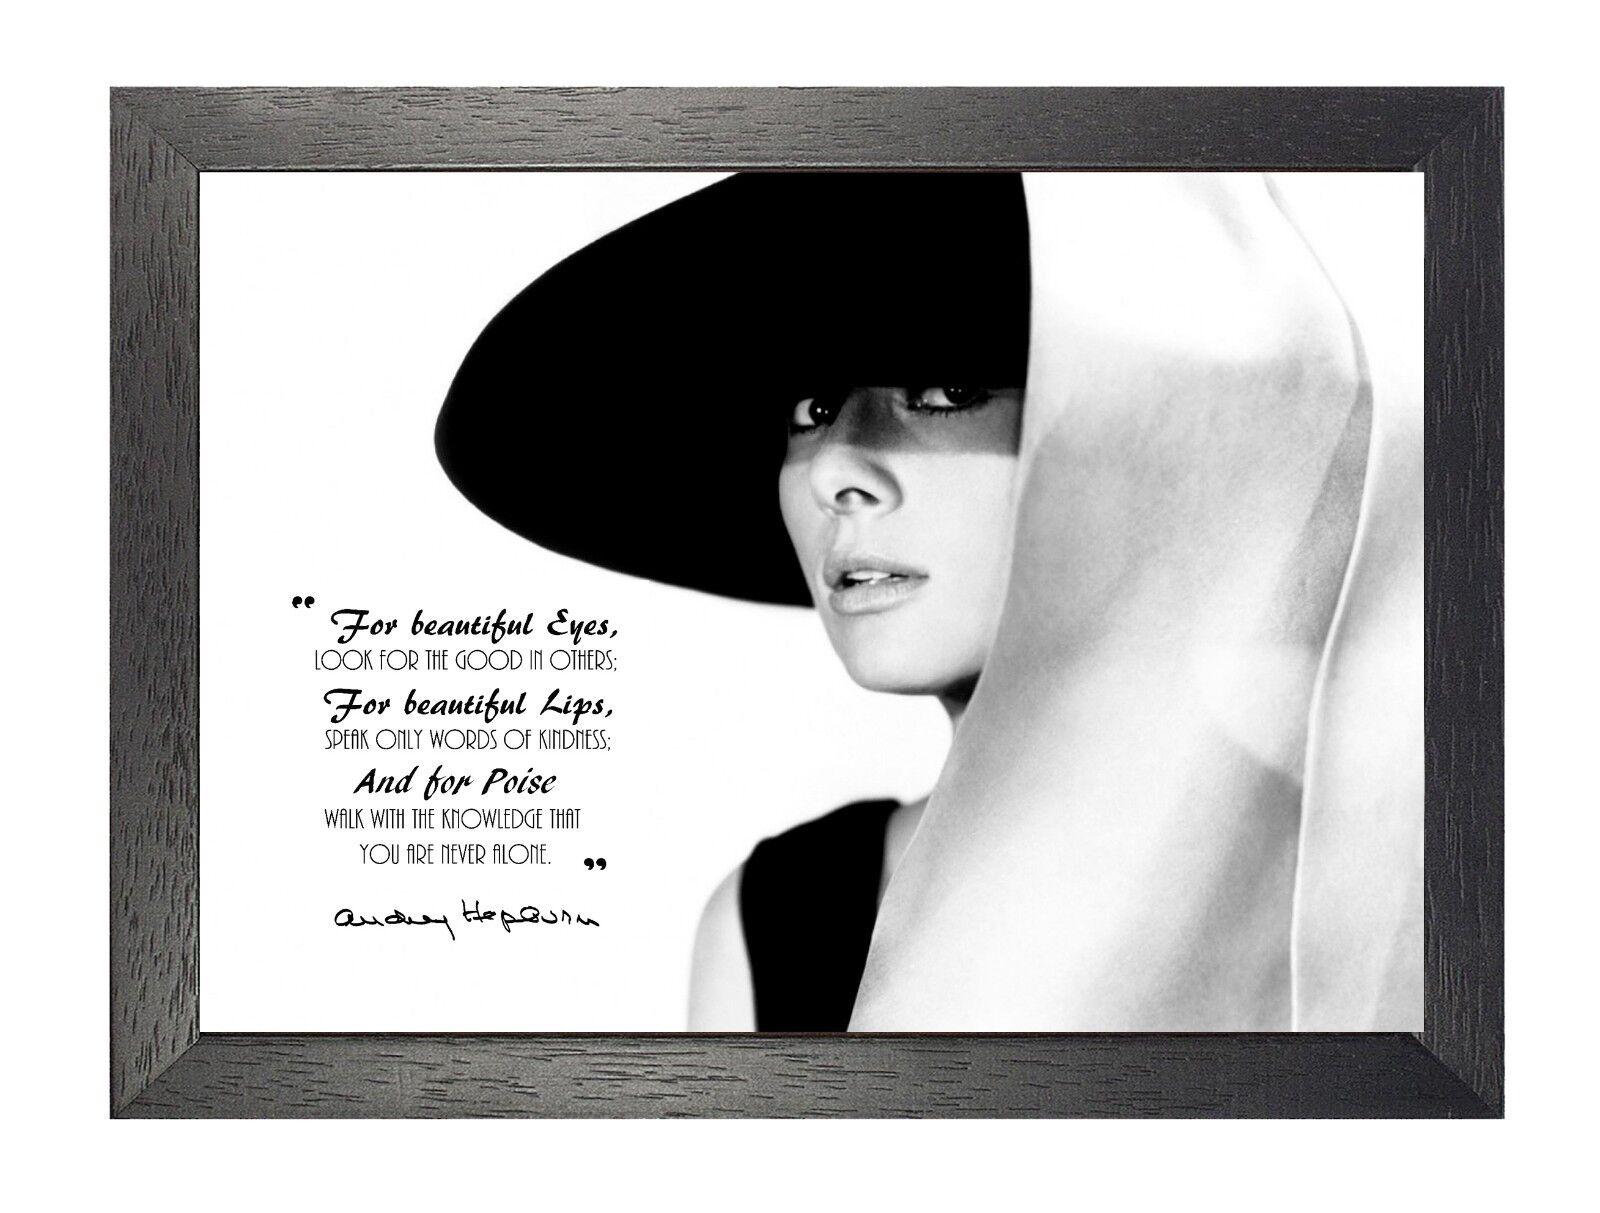 Audrey Hepburn 15 British Actress Model Motivation And Inspiration Poster Photo